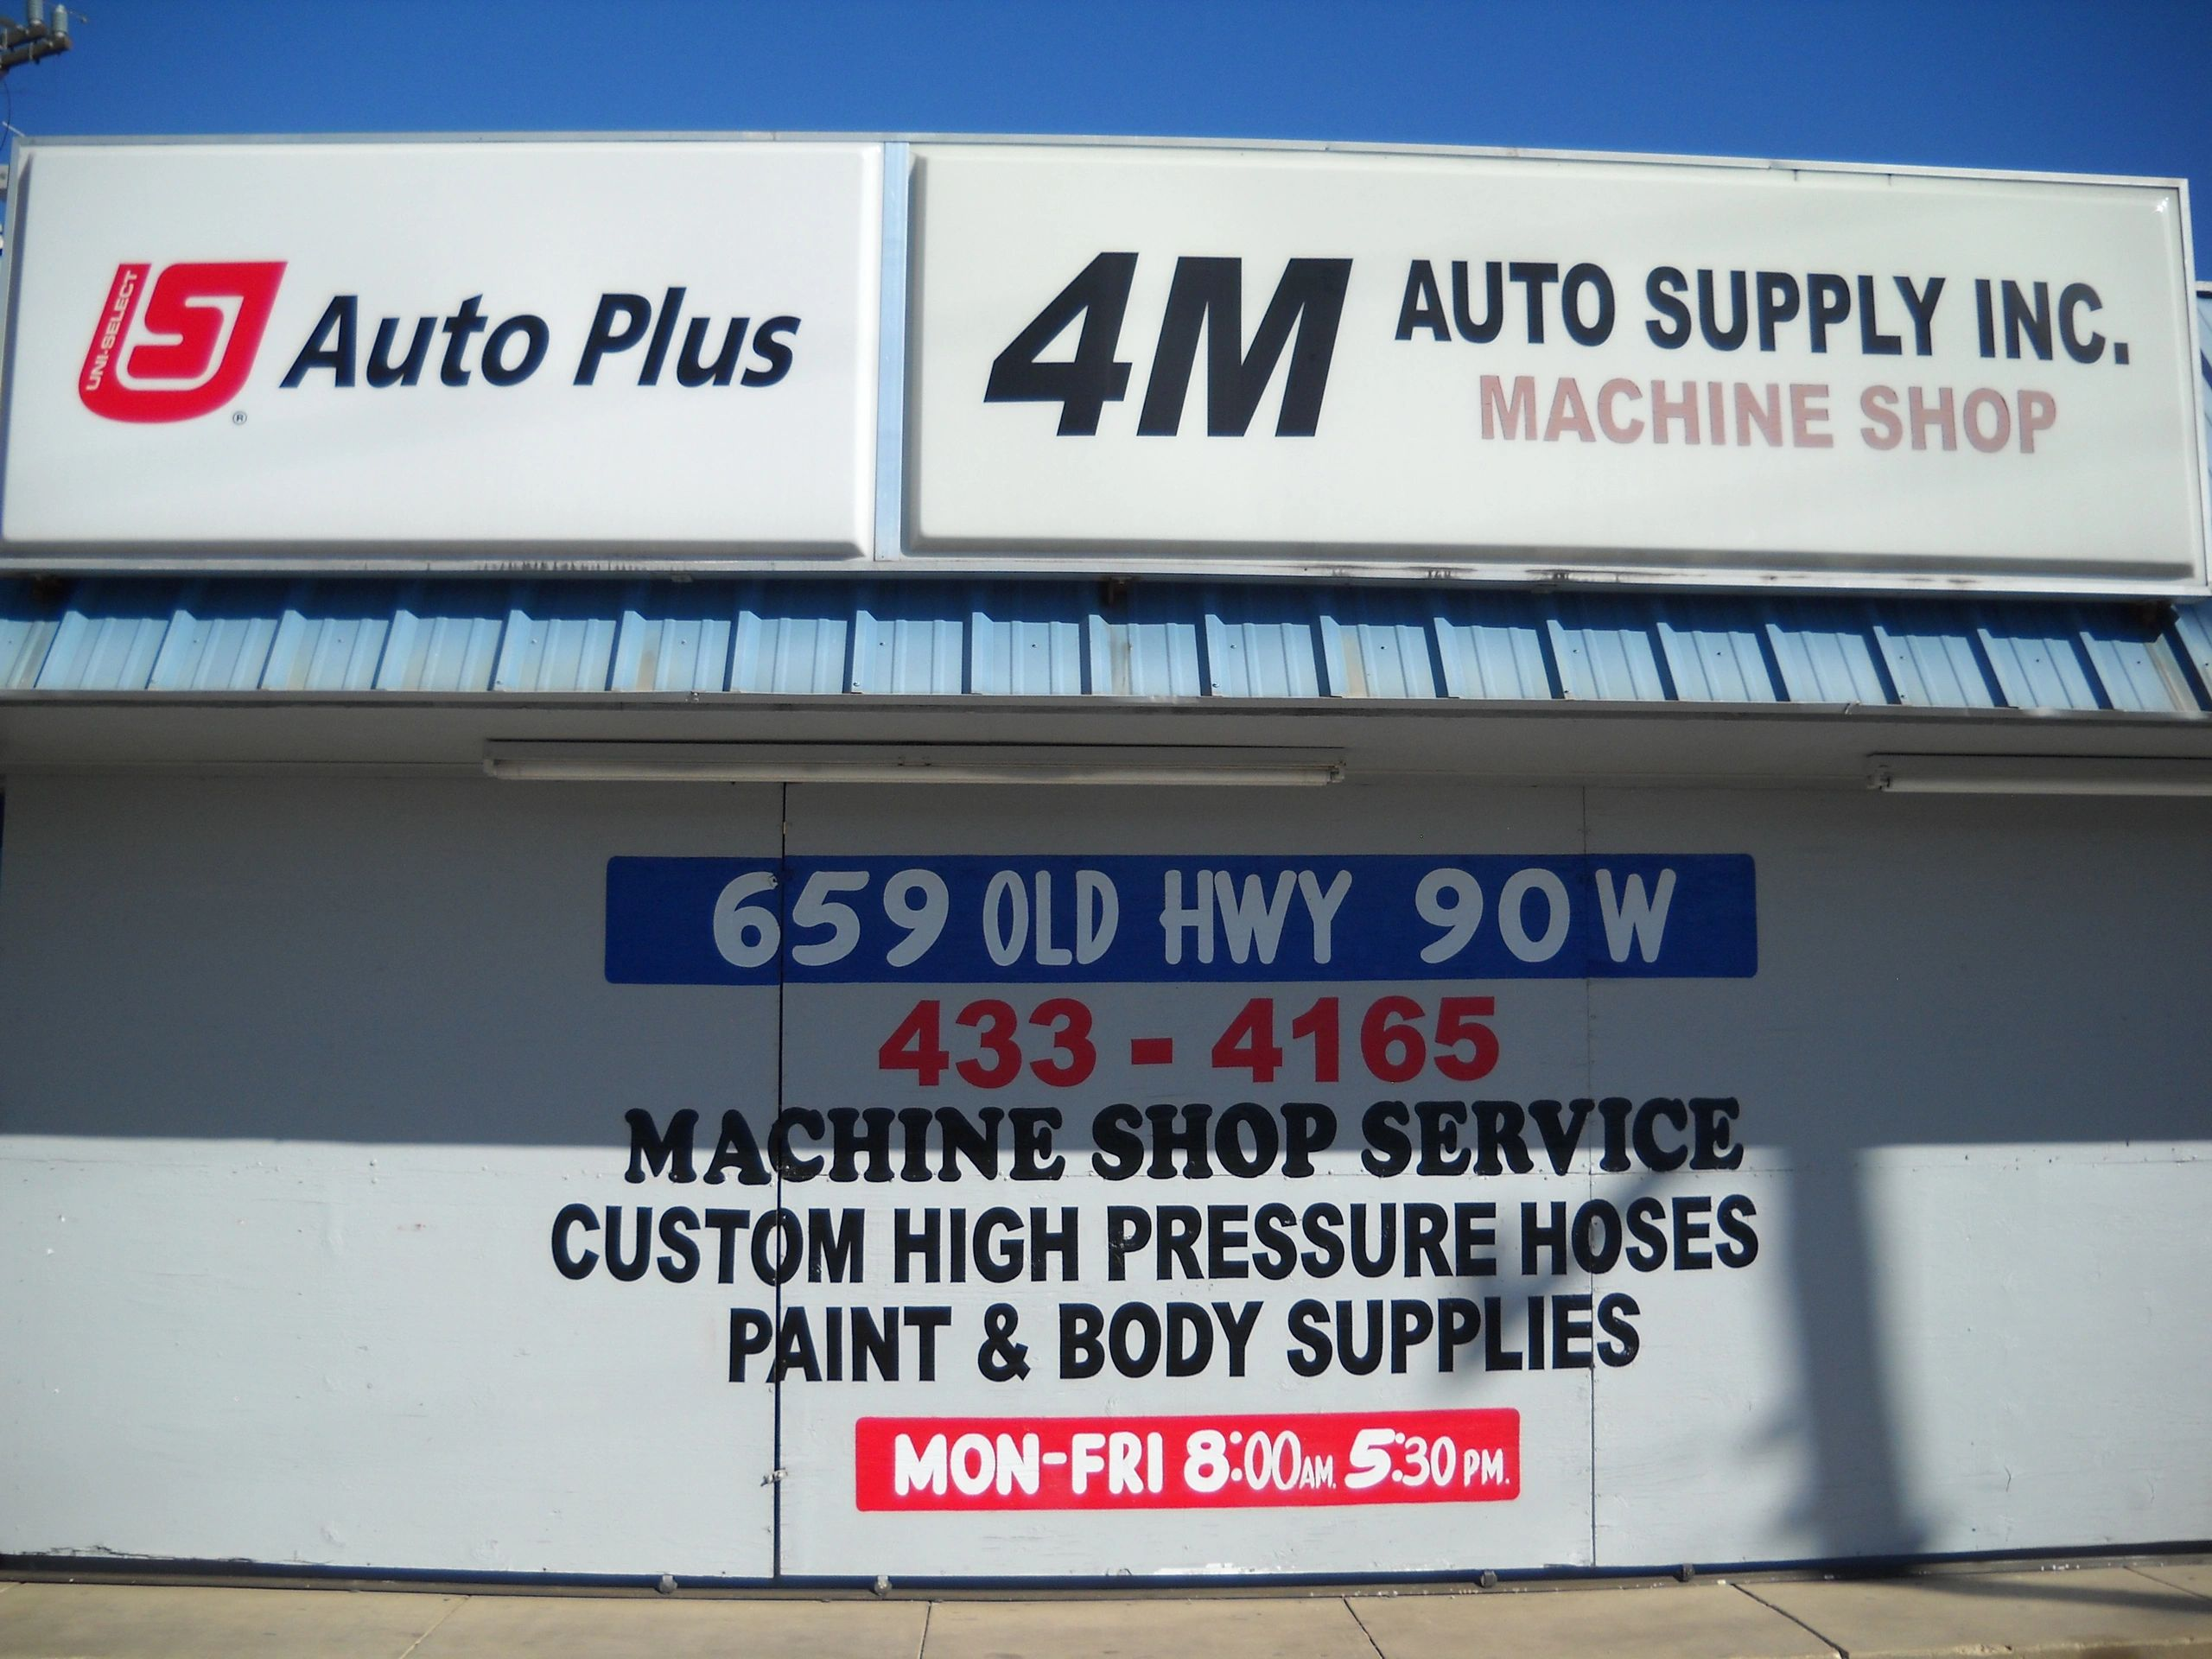 4m Auto Supply Inc